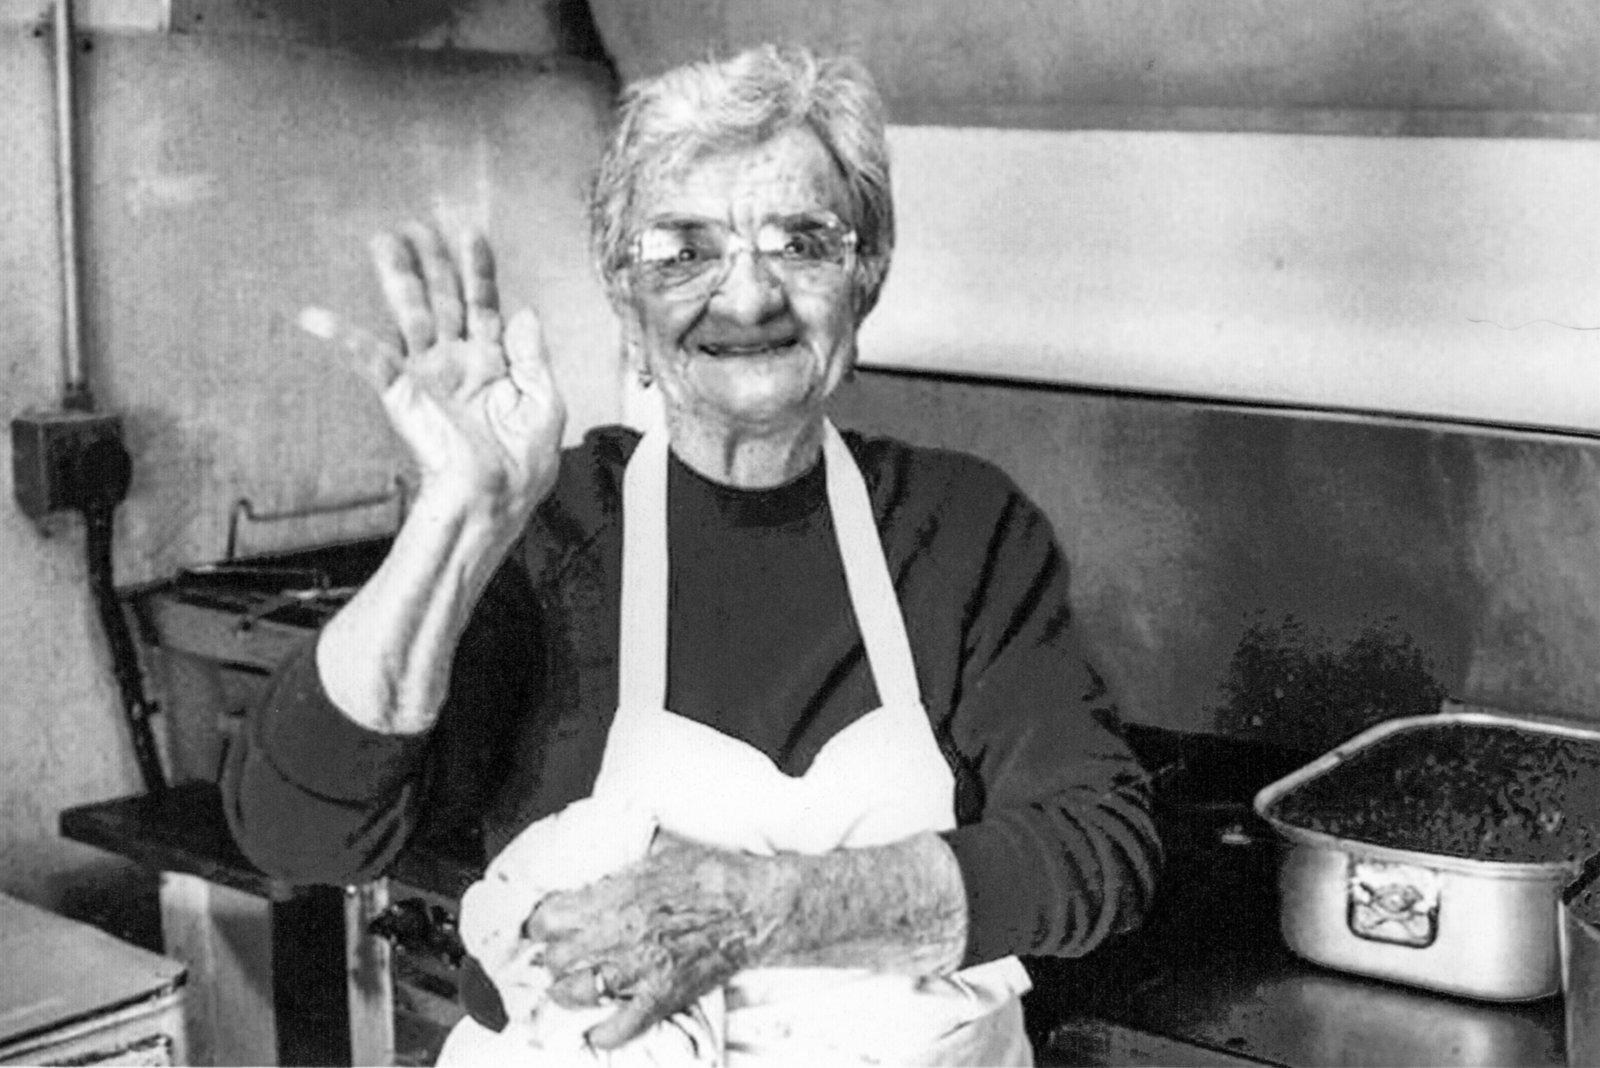 Alice Nizzi, spaghetti, Waukee, Iowa, food, Italian, history